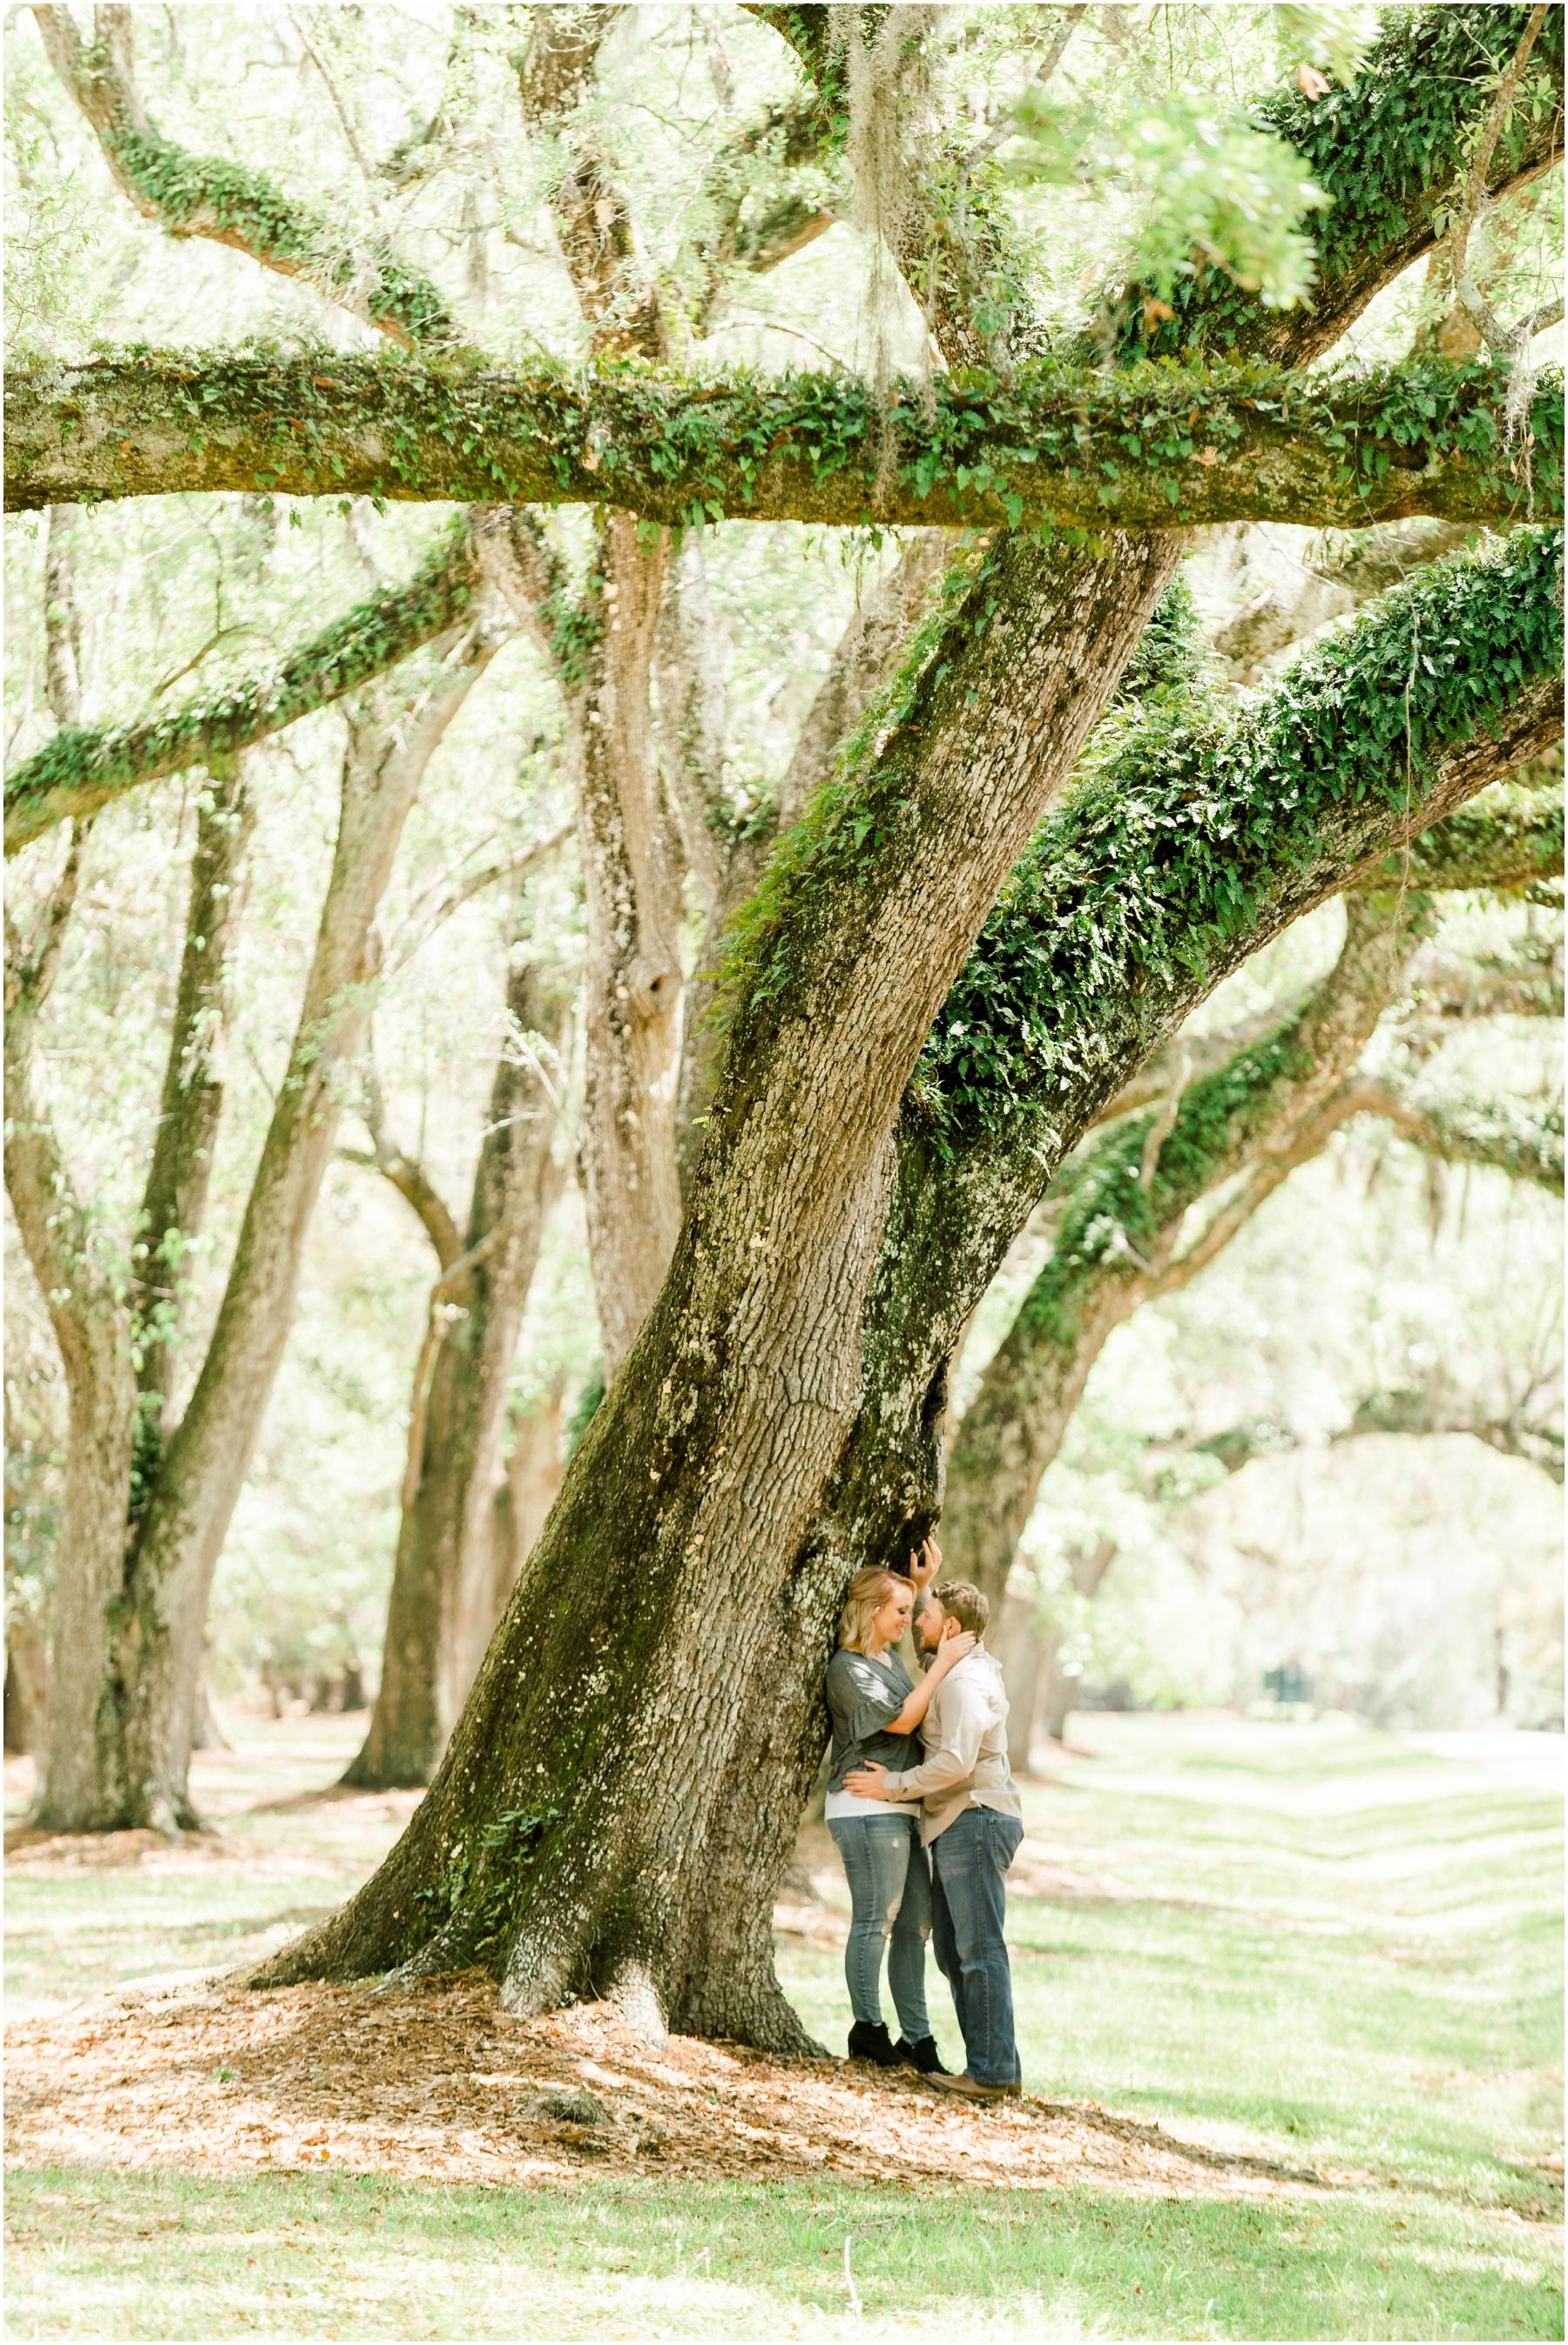 Mepkin-Abbey-Moncks-Corner-South-Carolina-Engagement-Session-Photos_0012.jpg